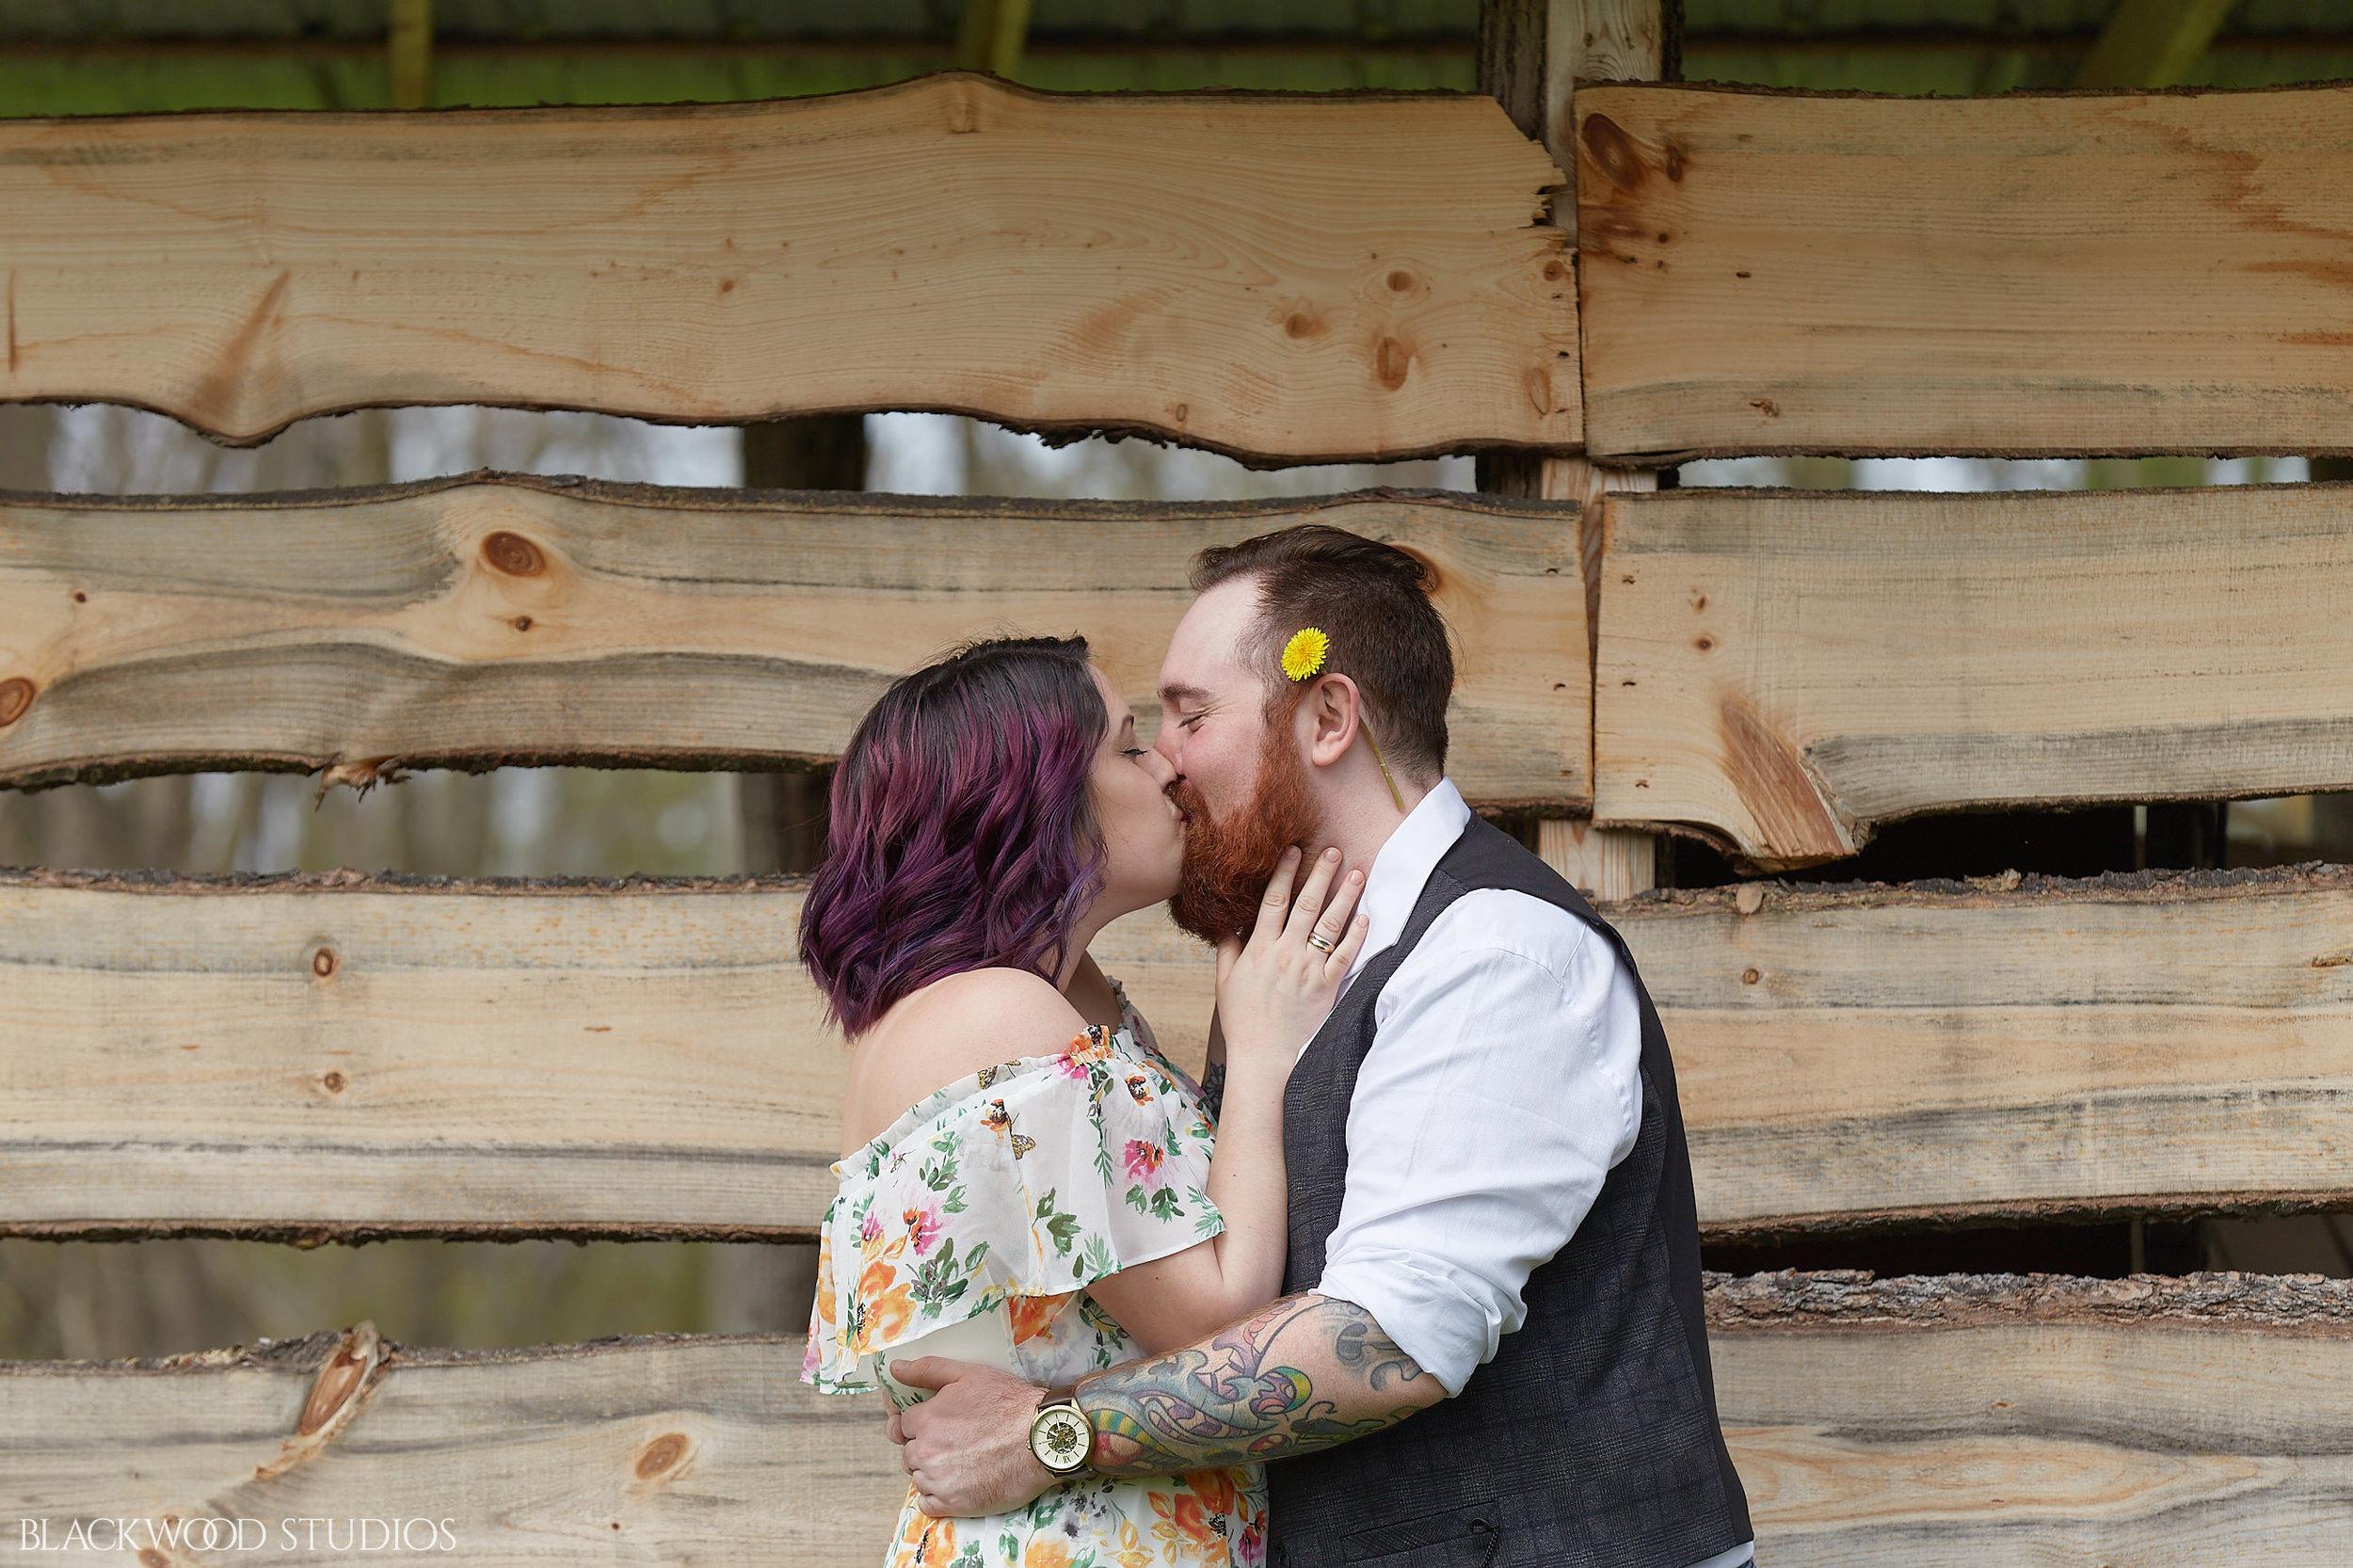 Blackwood-Studios-Photography-20190519163130-David-Kalin-Engagement-Session-Mount-Nemo-Scout-Camp-Burlington-Ontario-Canada.jpg